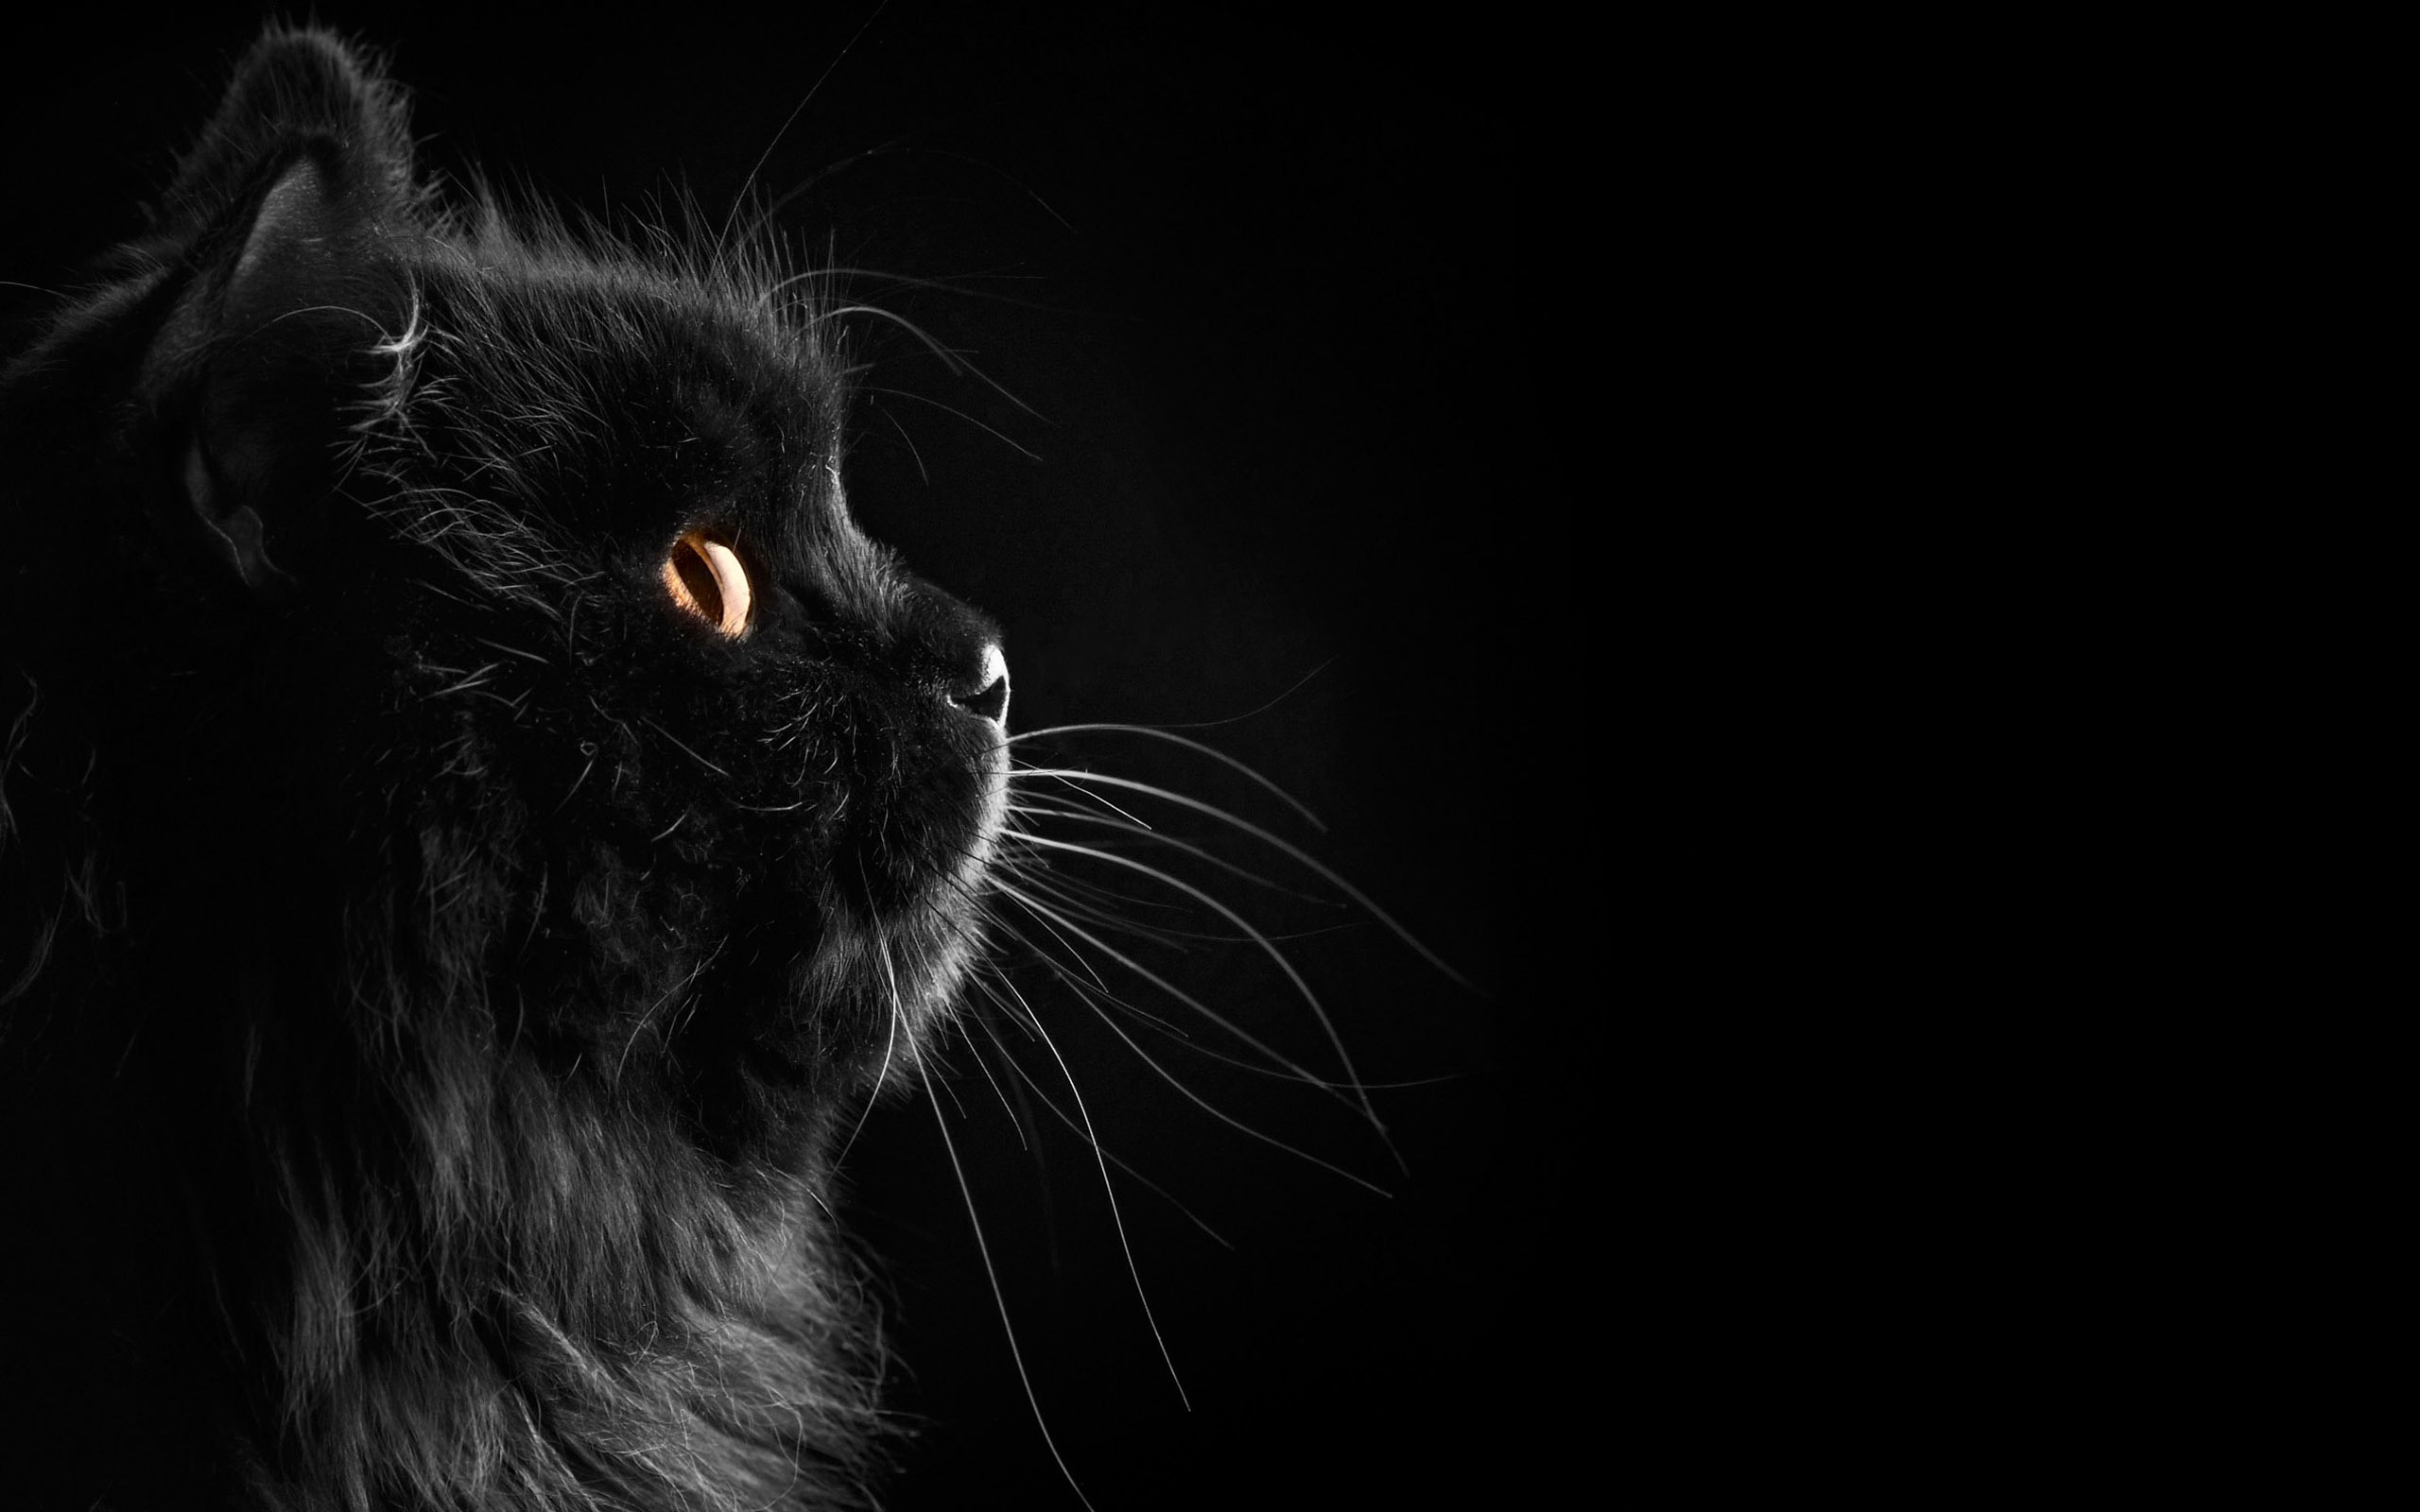 … black cat wallpaper 24160 px hdwallsource com …